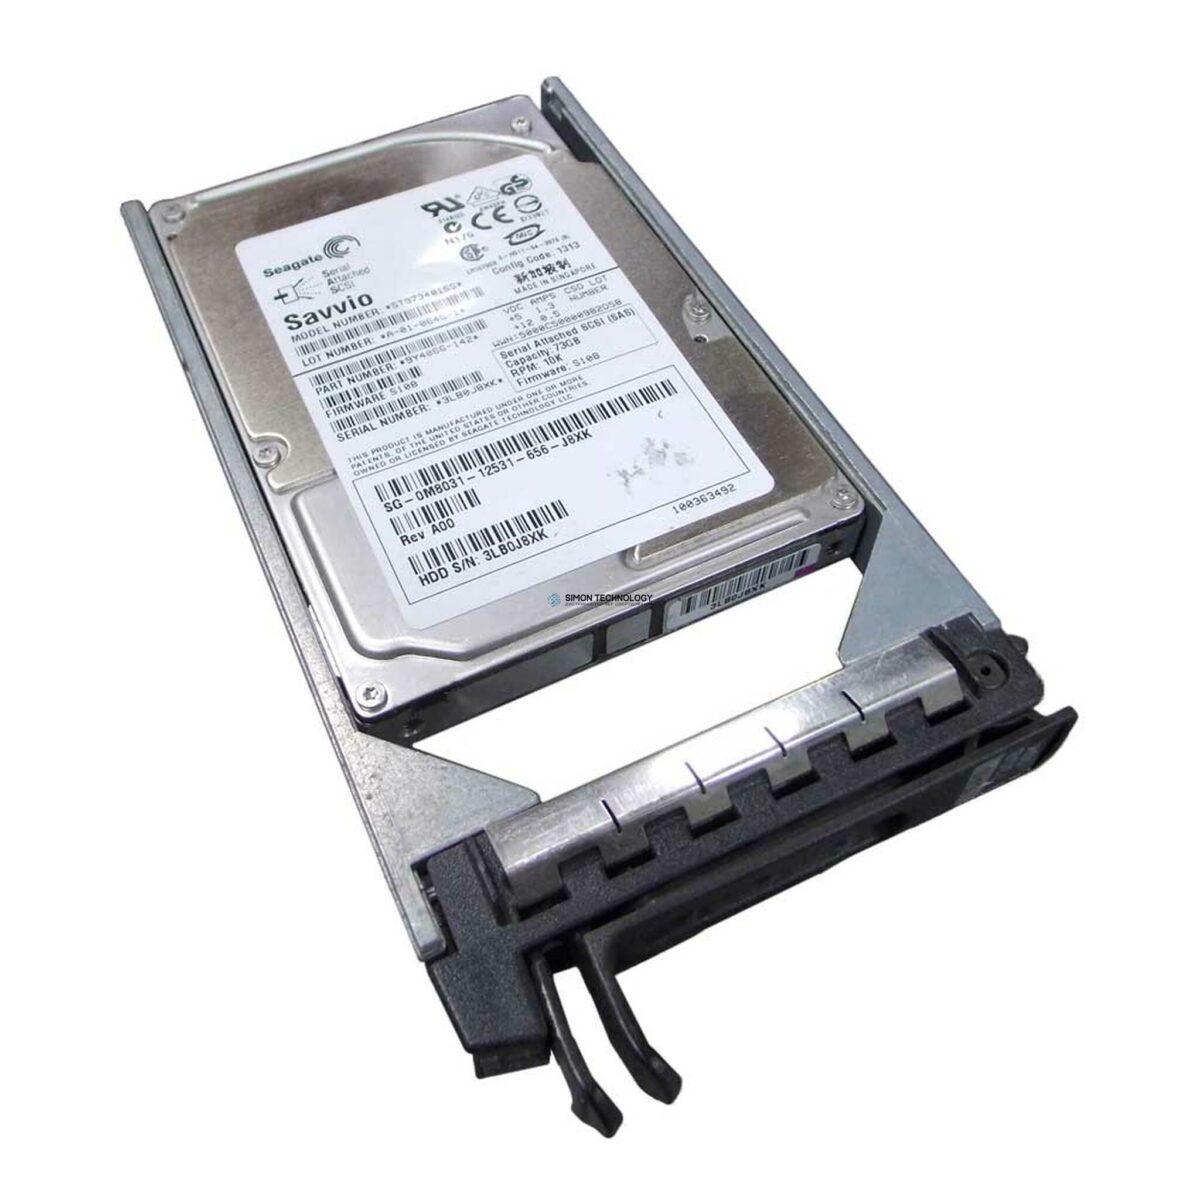 HPE 73GB 10K COM. Tray DR. (P3578-69001)